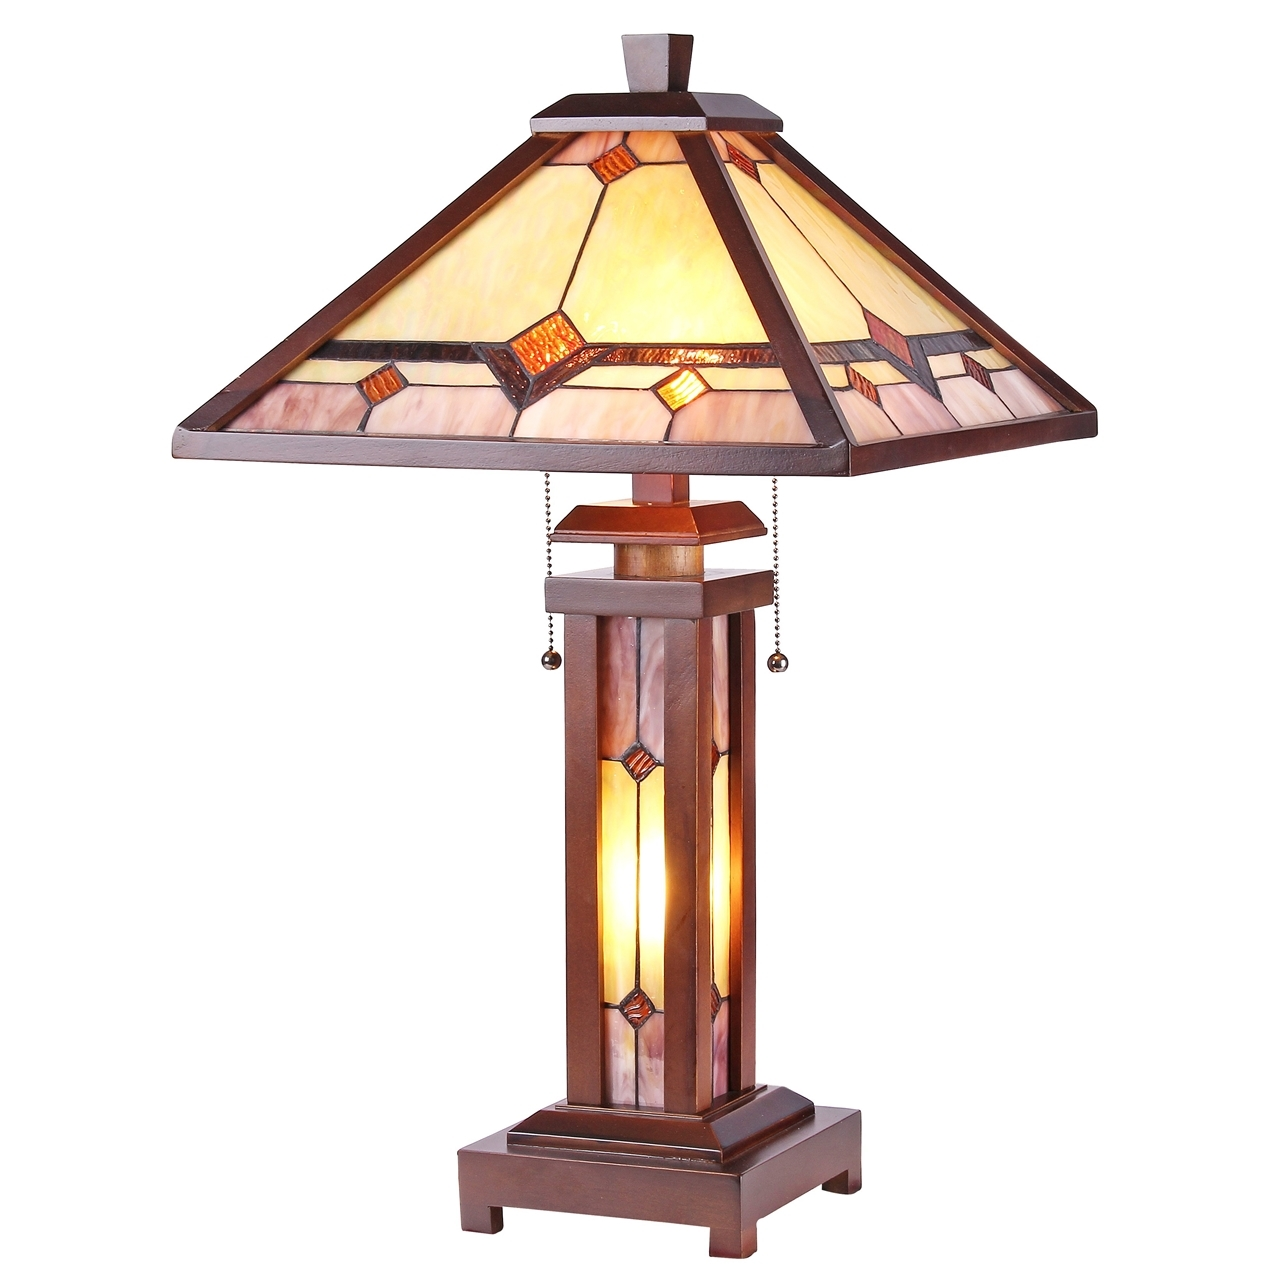 CHLOE Lighting, Inc Tiffany Lamp, Tiffany Lamps, Tiffany Style lamp ...